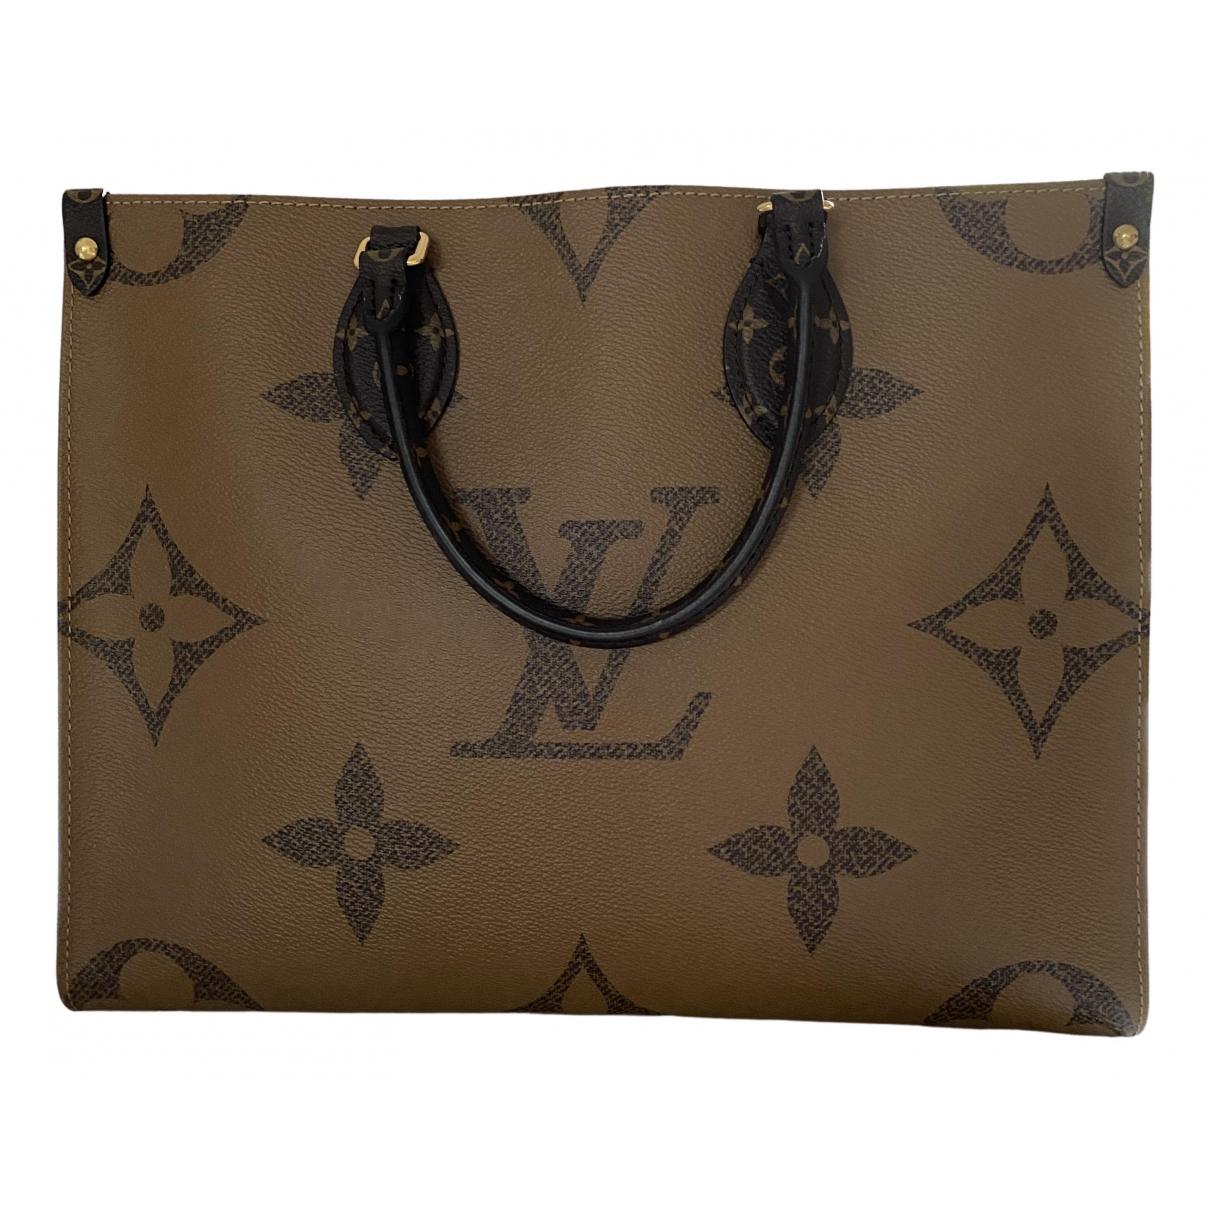 Louis Vuitton - Sac a main Onthego pour femme en toile - marron